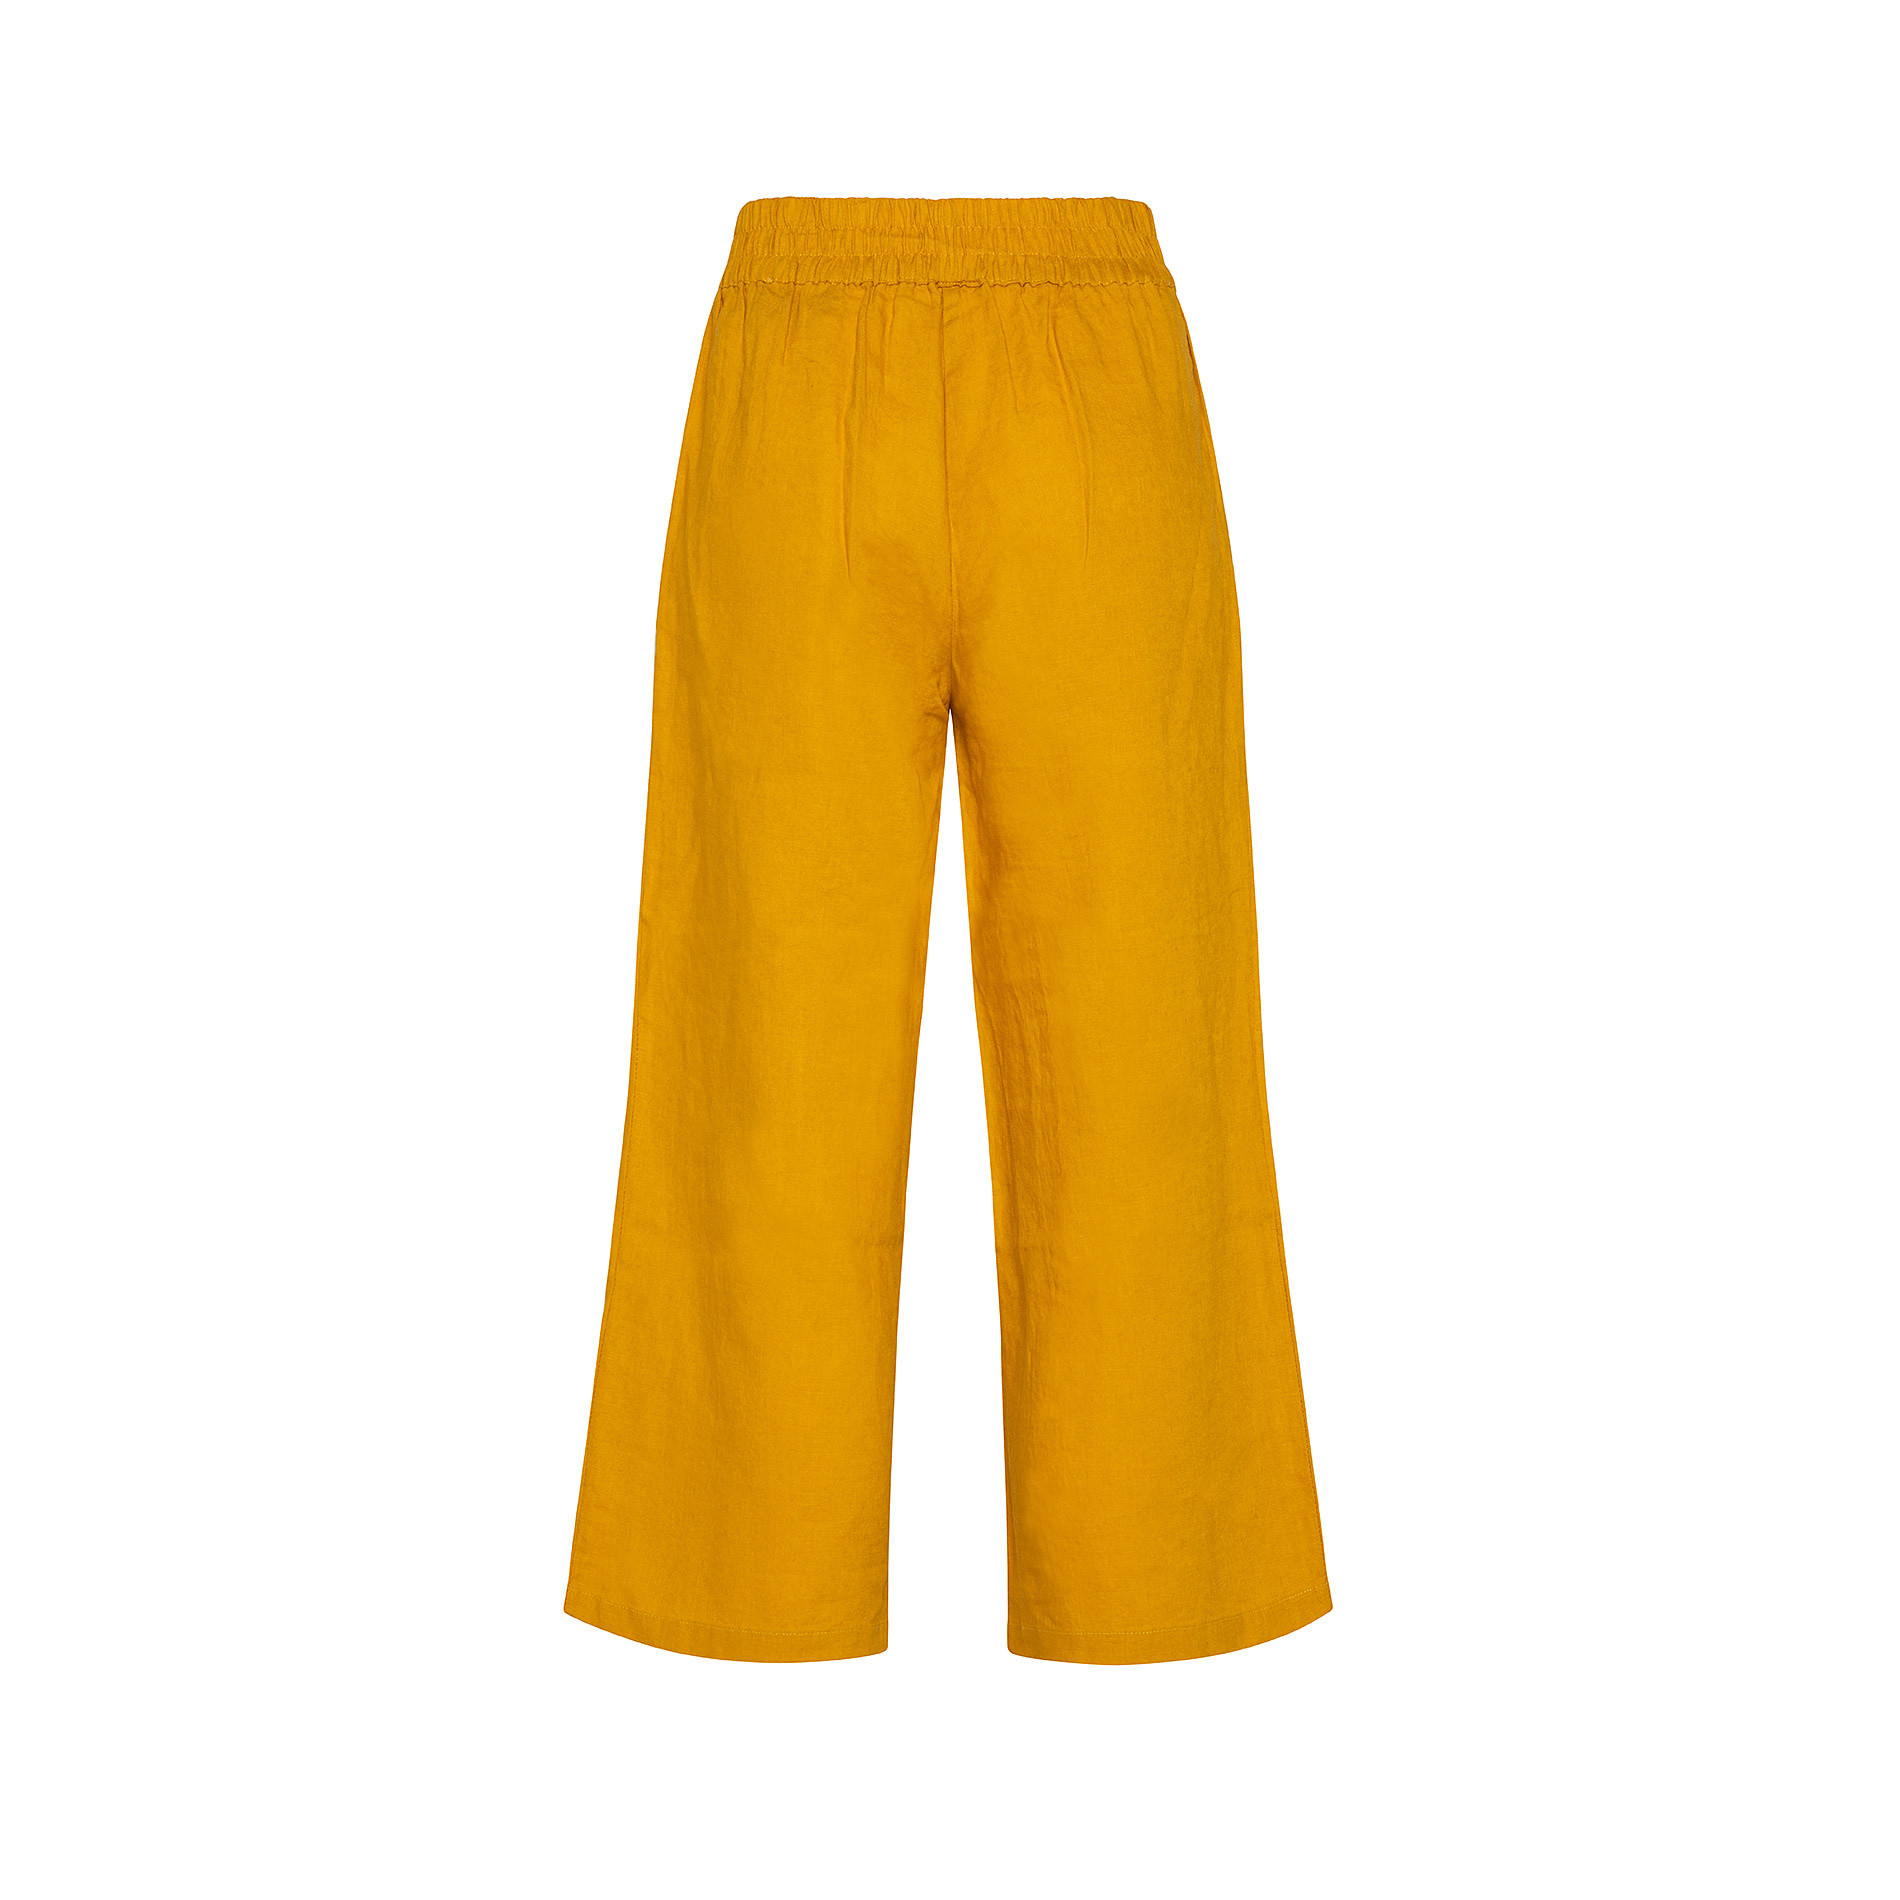 Pantalone puro lino con fusciacca Koan, Arancione, large image number 1